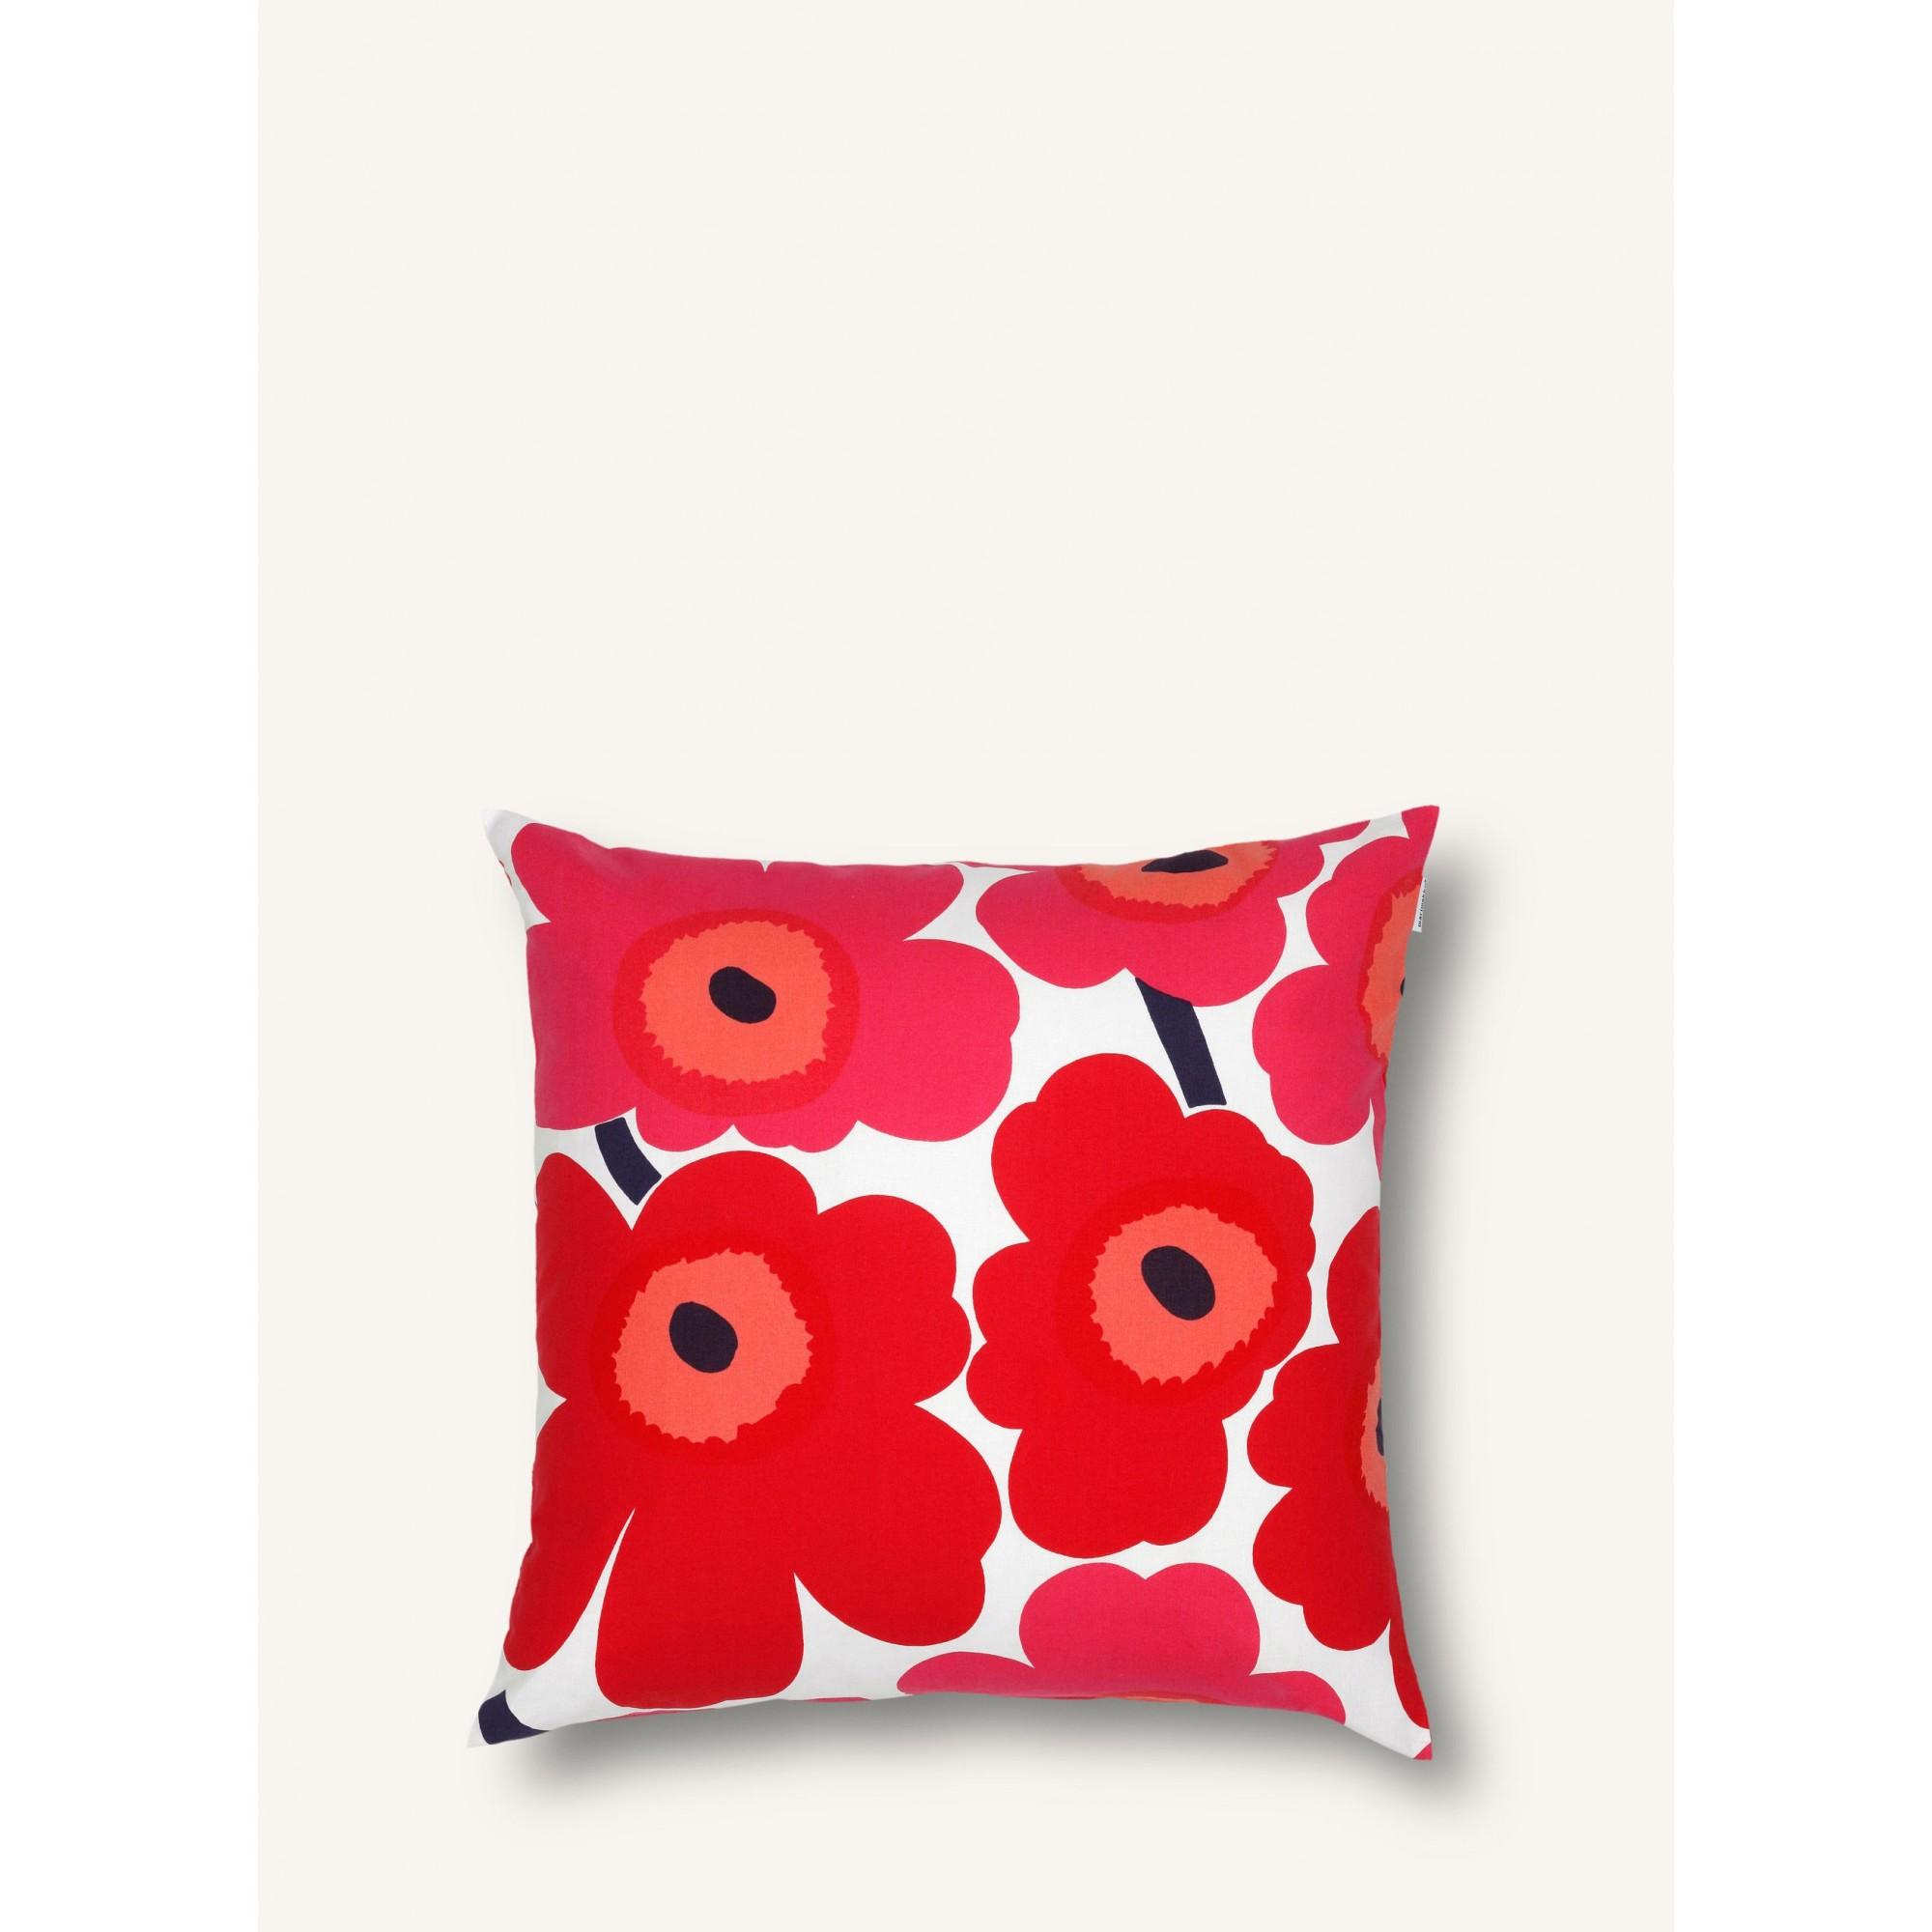 Pieni Unikko cushion cover 50 x 50 cm, white, red Cushion covers